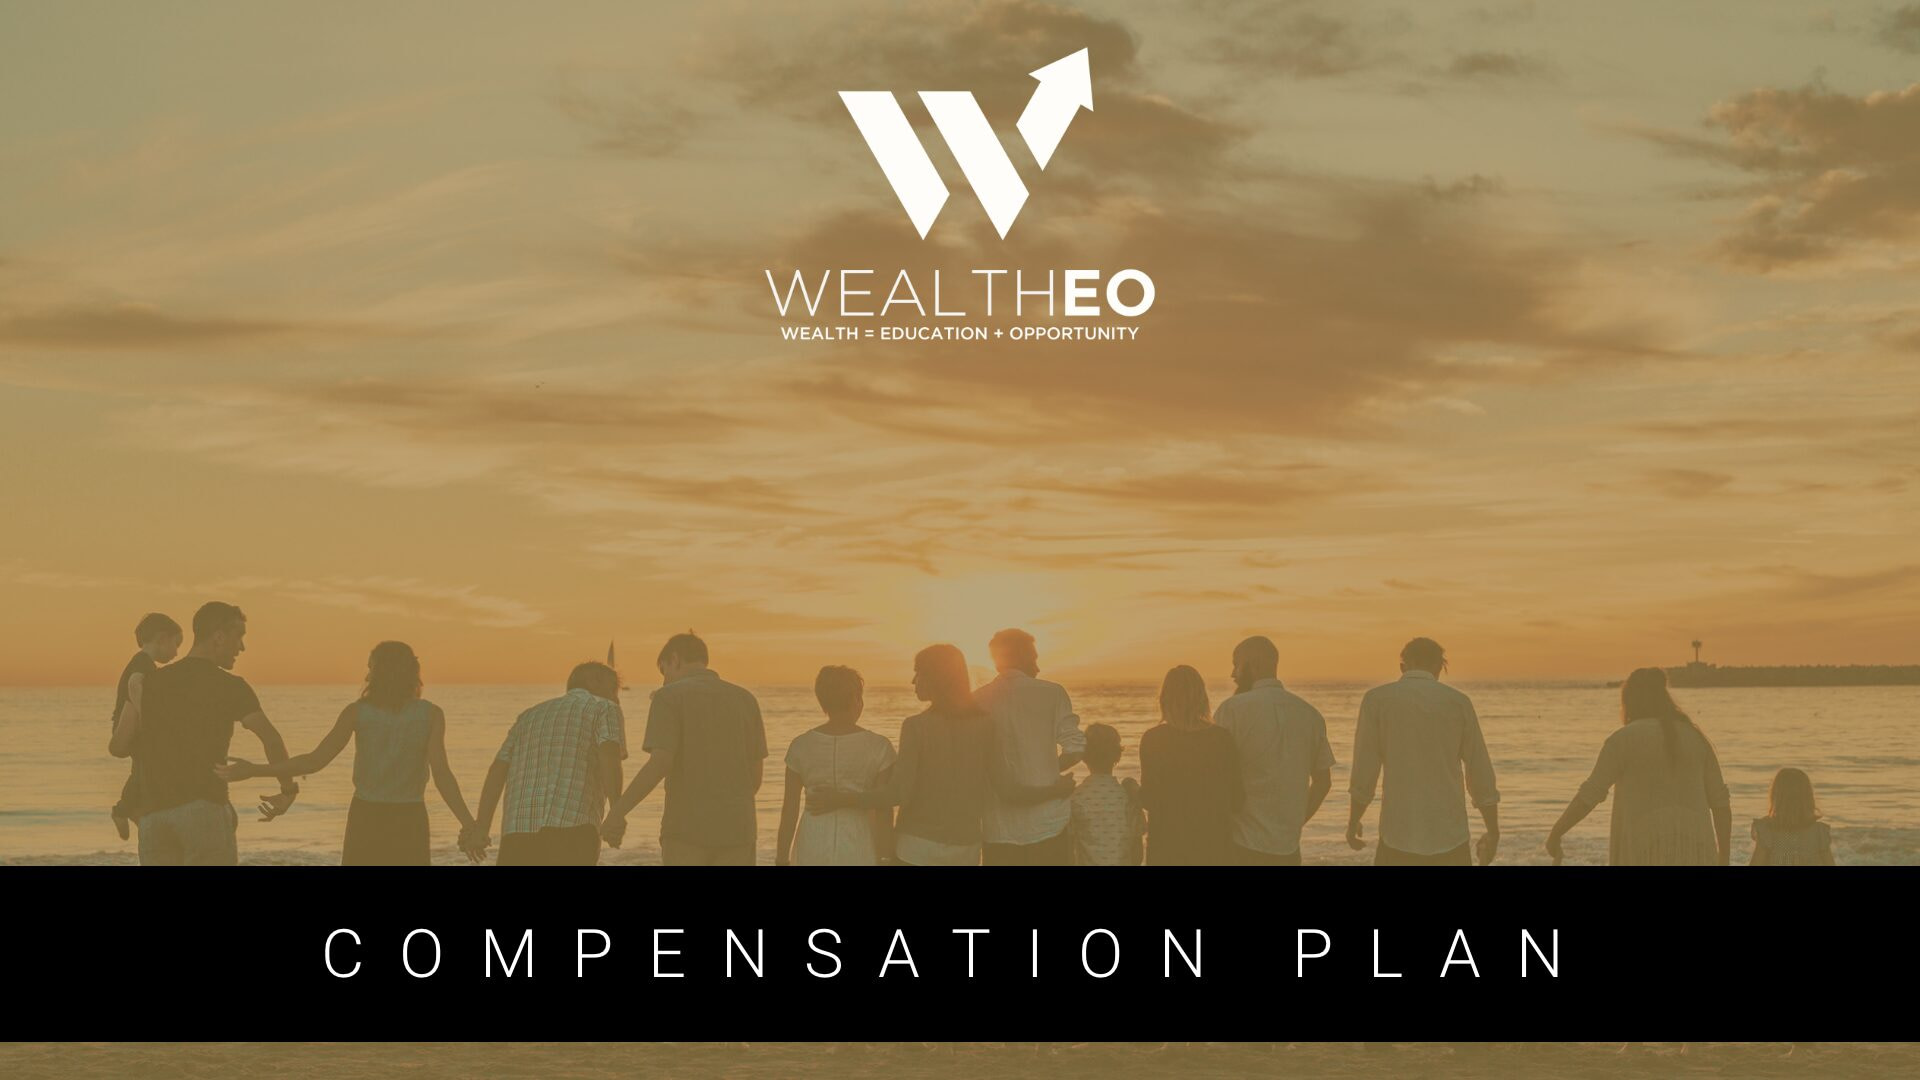 Wealtheo Compensation Plan